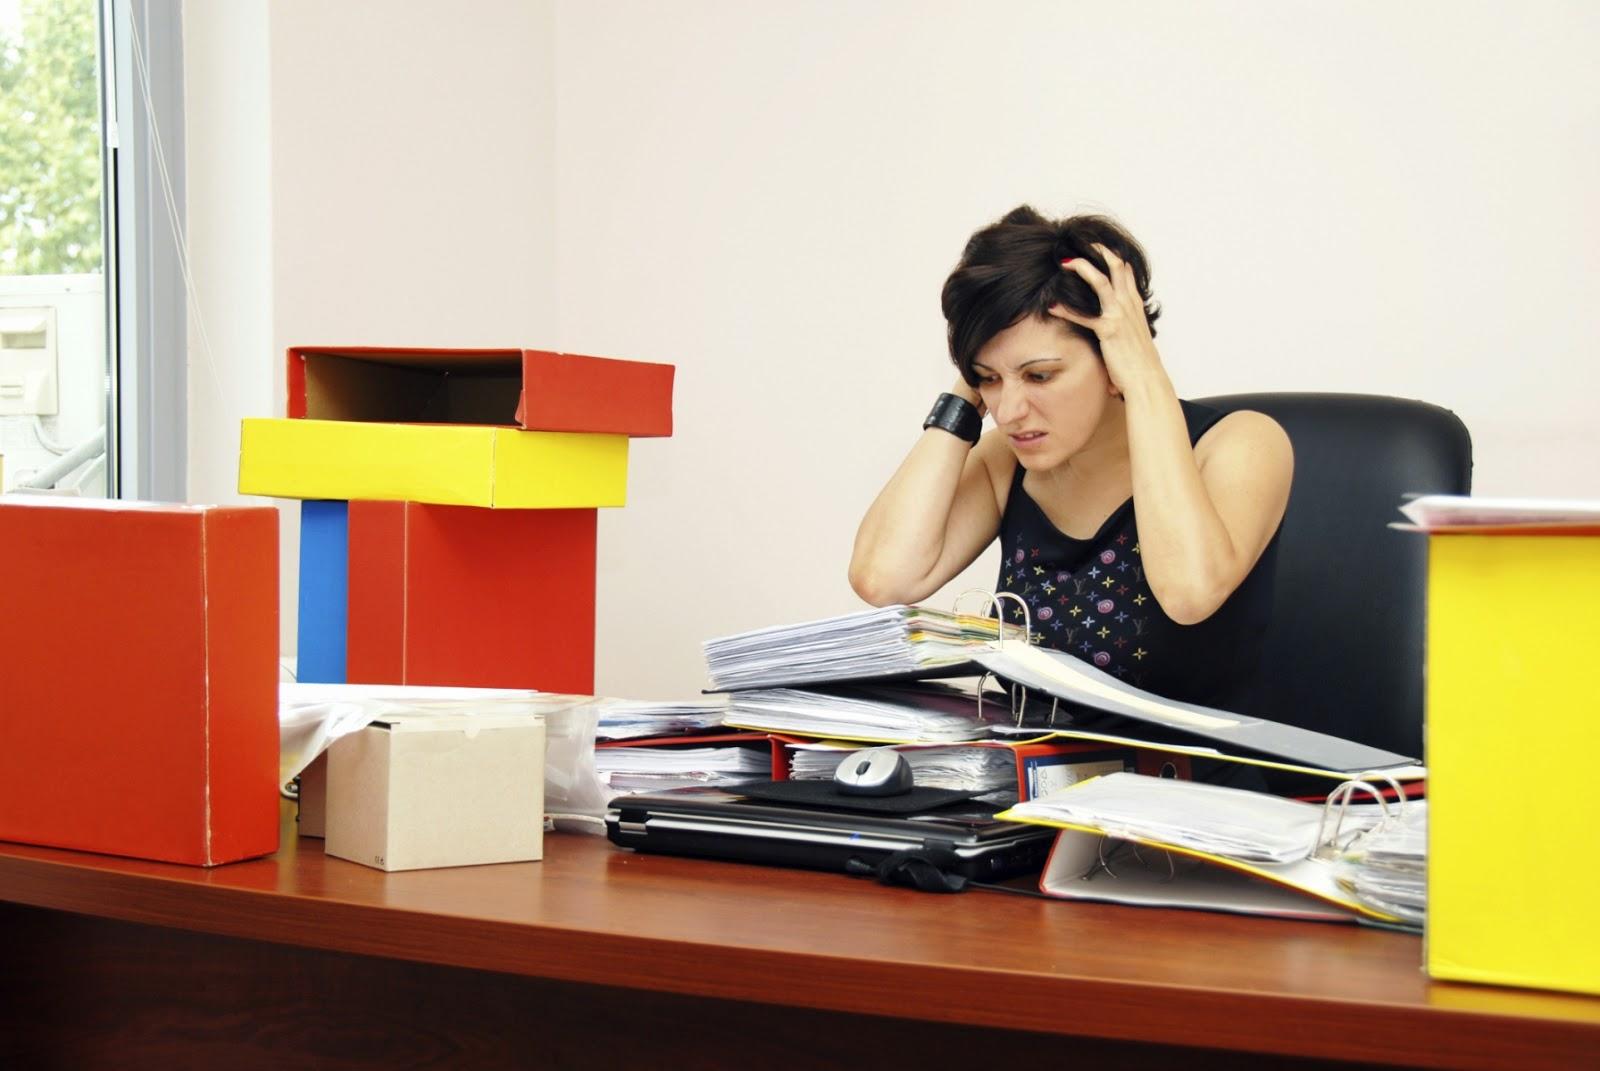 El Fenómeno del estrés Laboral